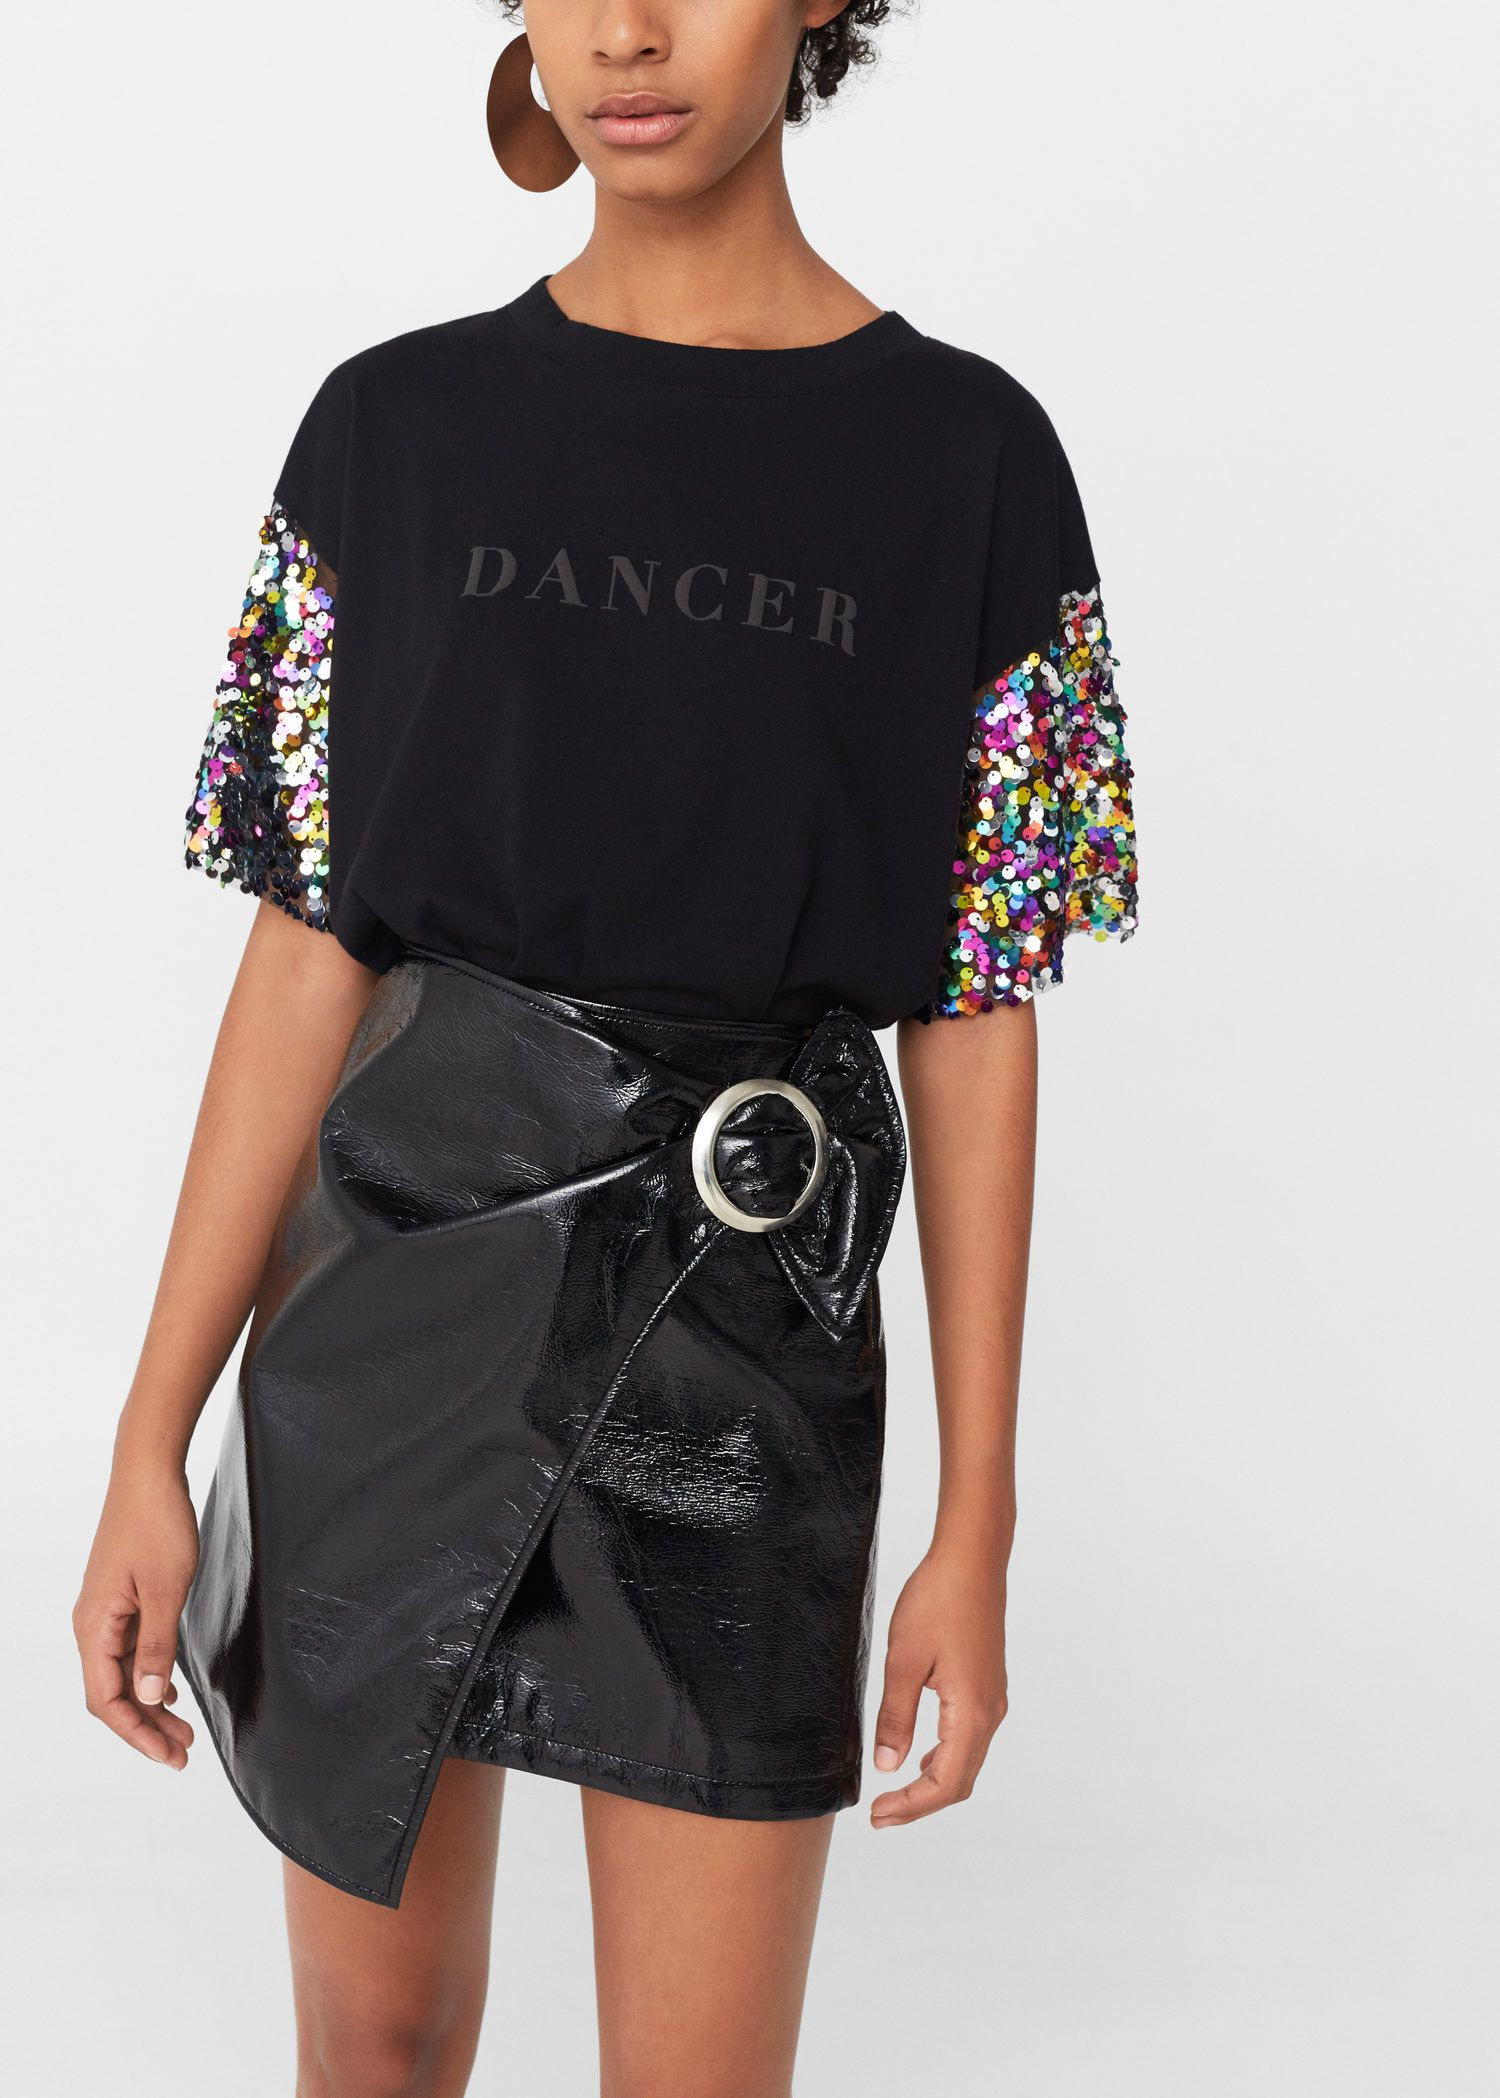 8c493b8bd Camiseta lentejuelas - Camisetas de Mujer